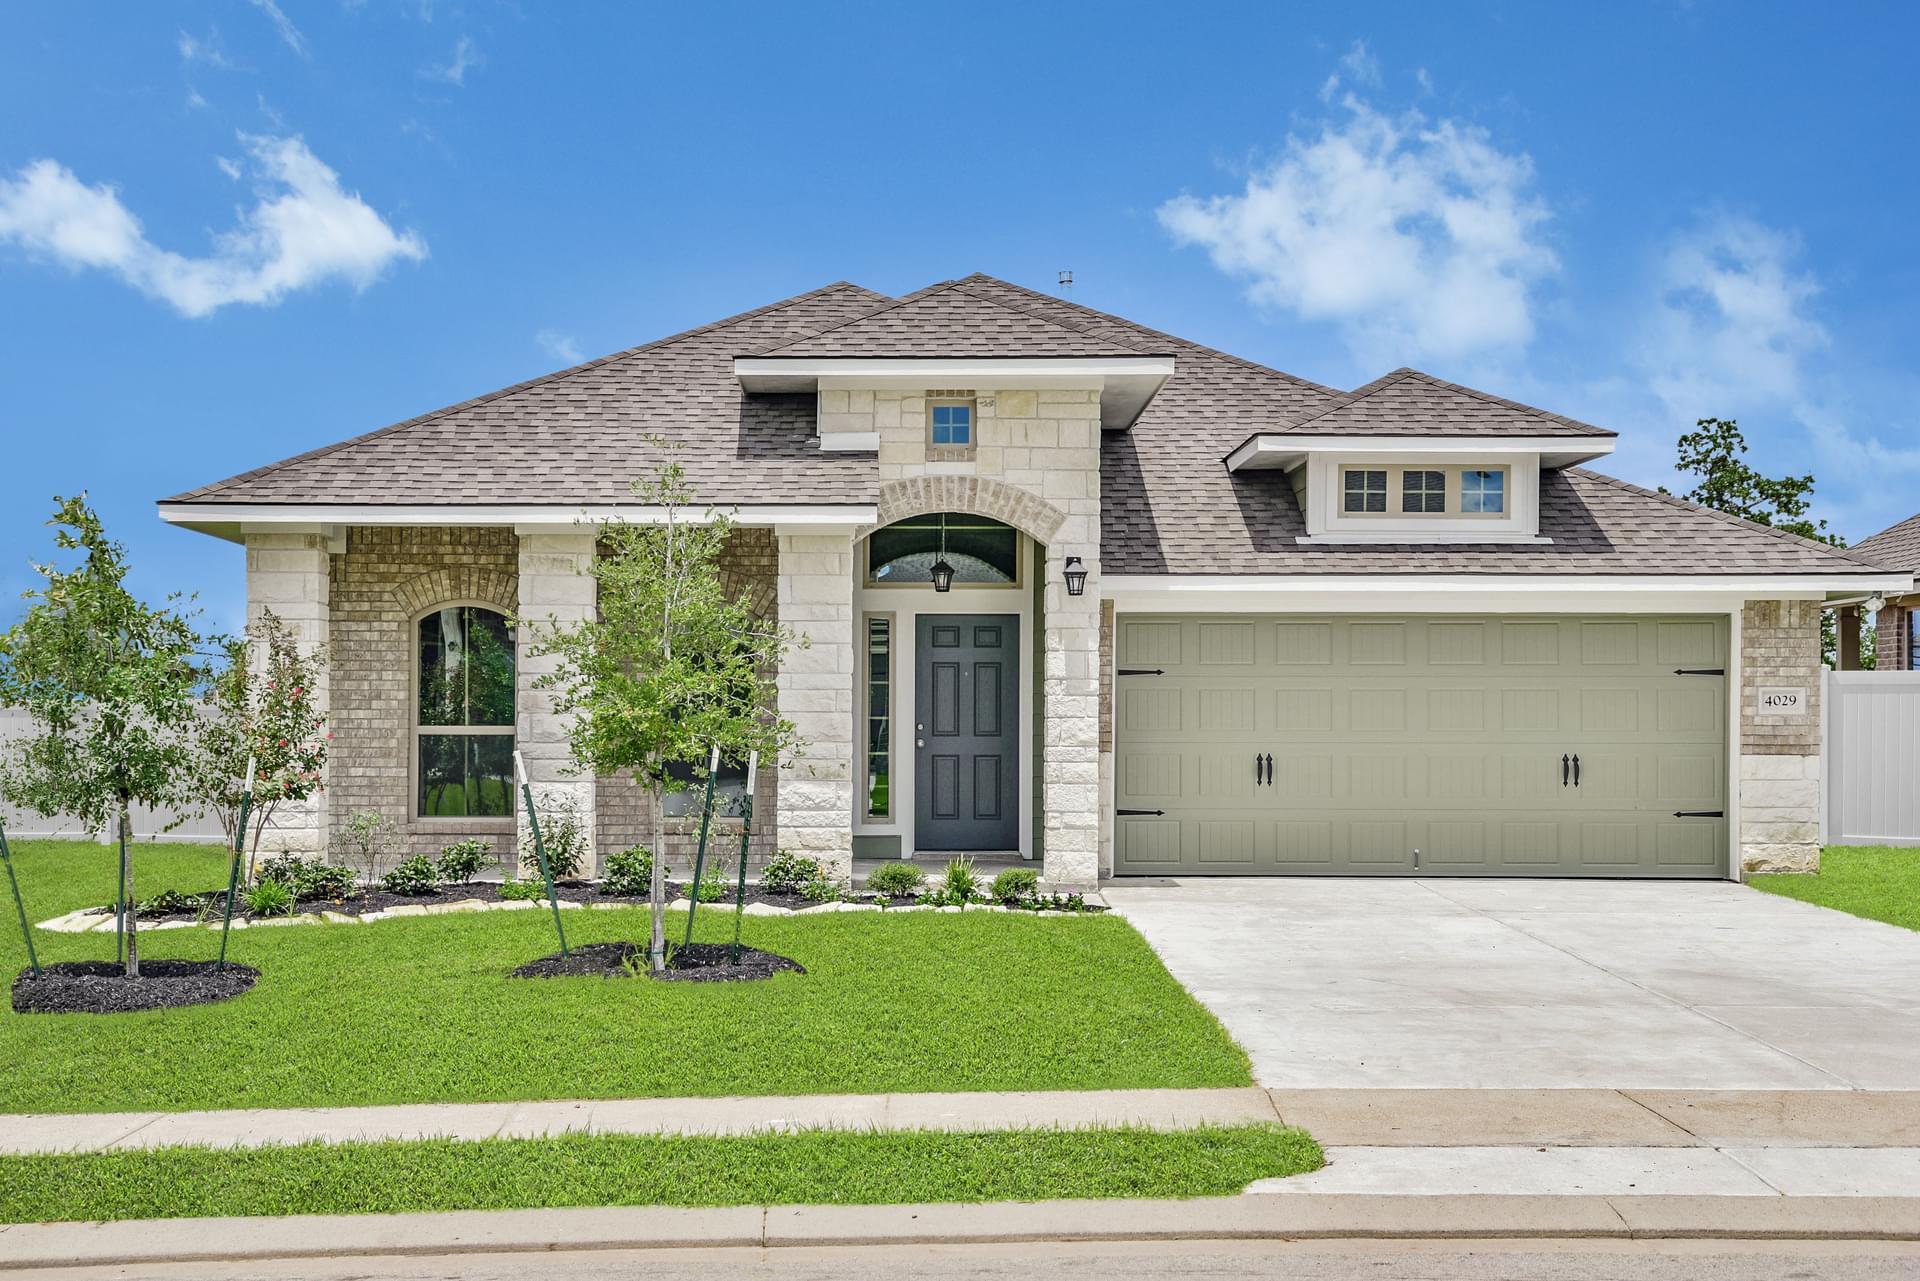 3121 Samson Drive in Waco, TX